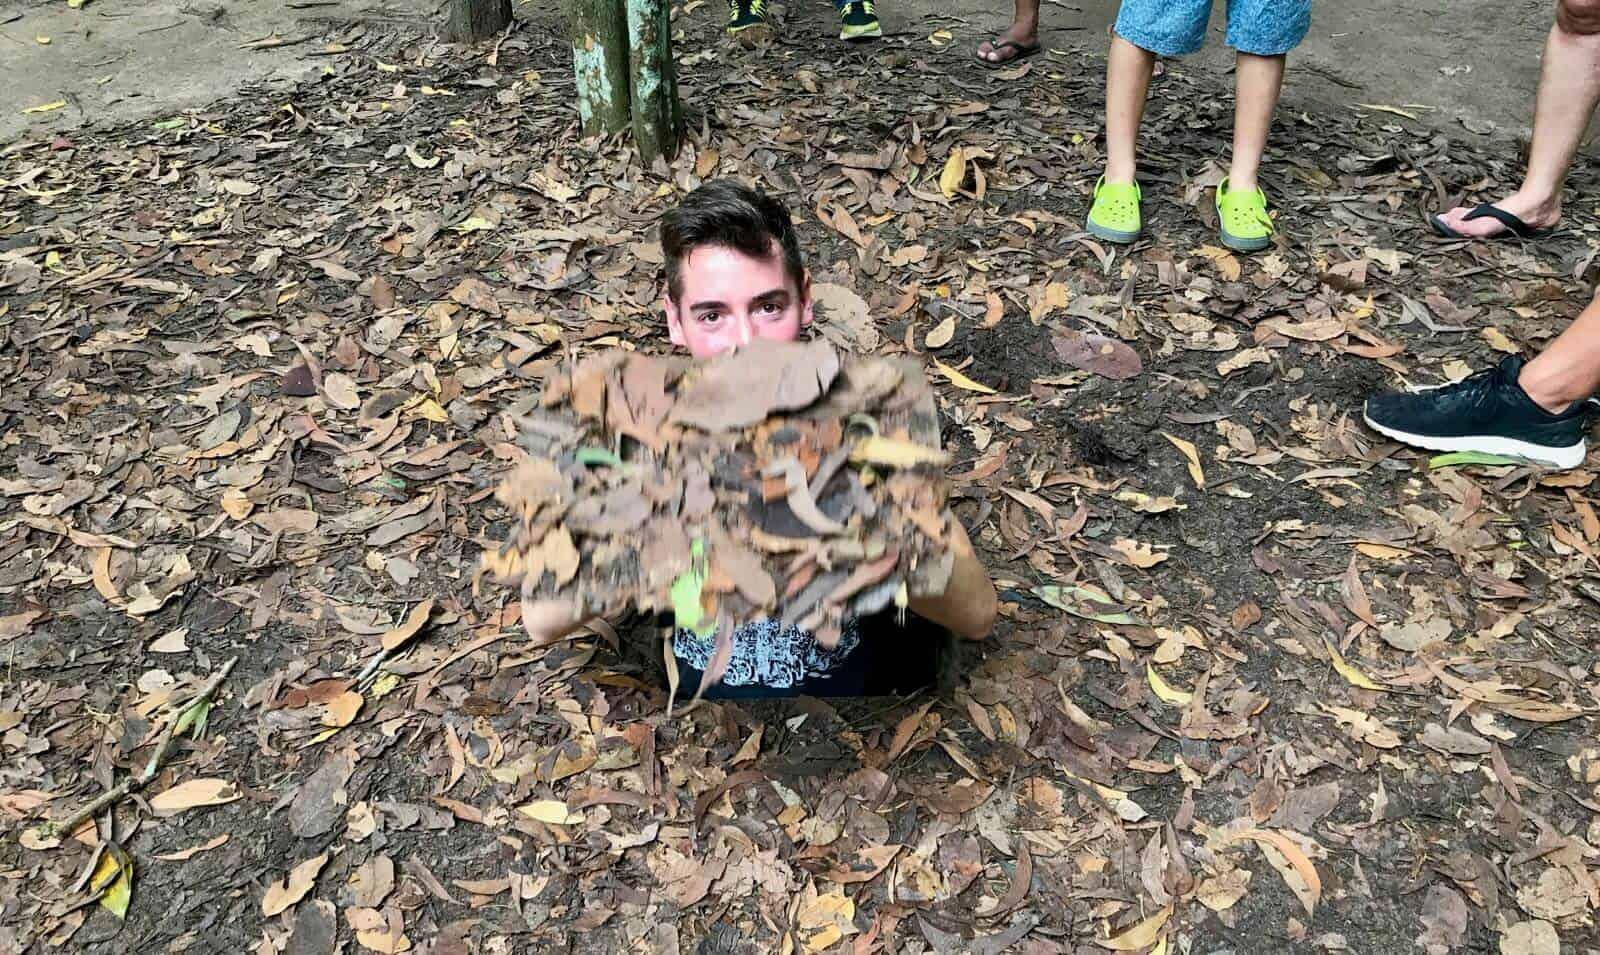 Phil Cu Chi Vietnam jungle camouflage betternotstop